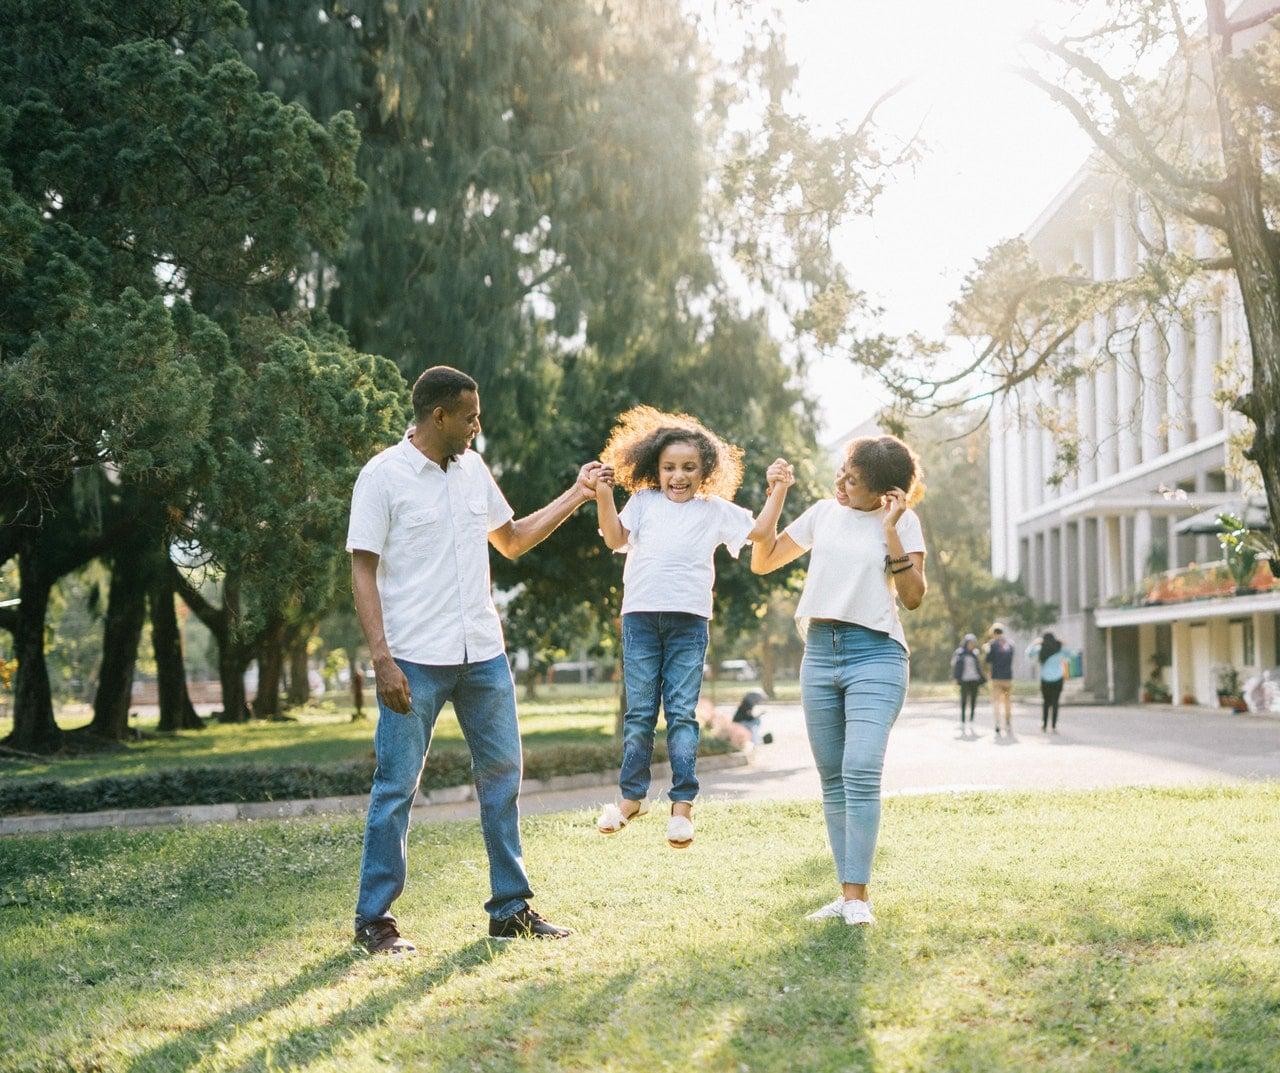 Family Time - Estate Planning Worksheet